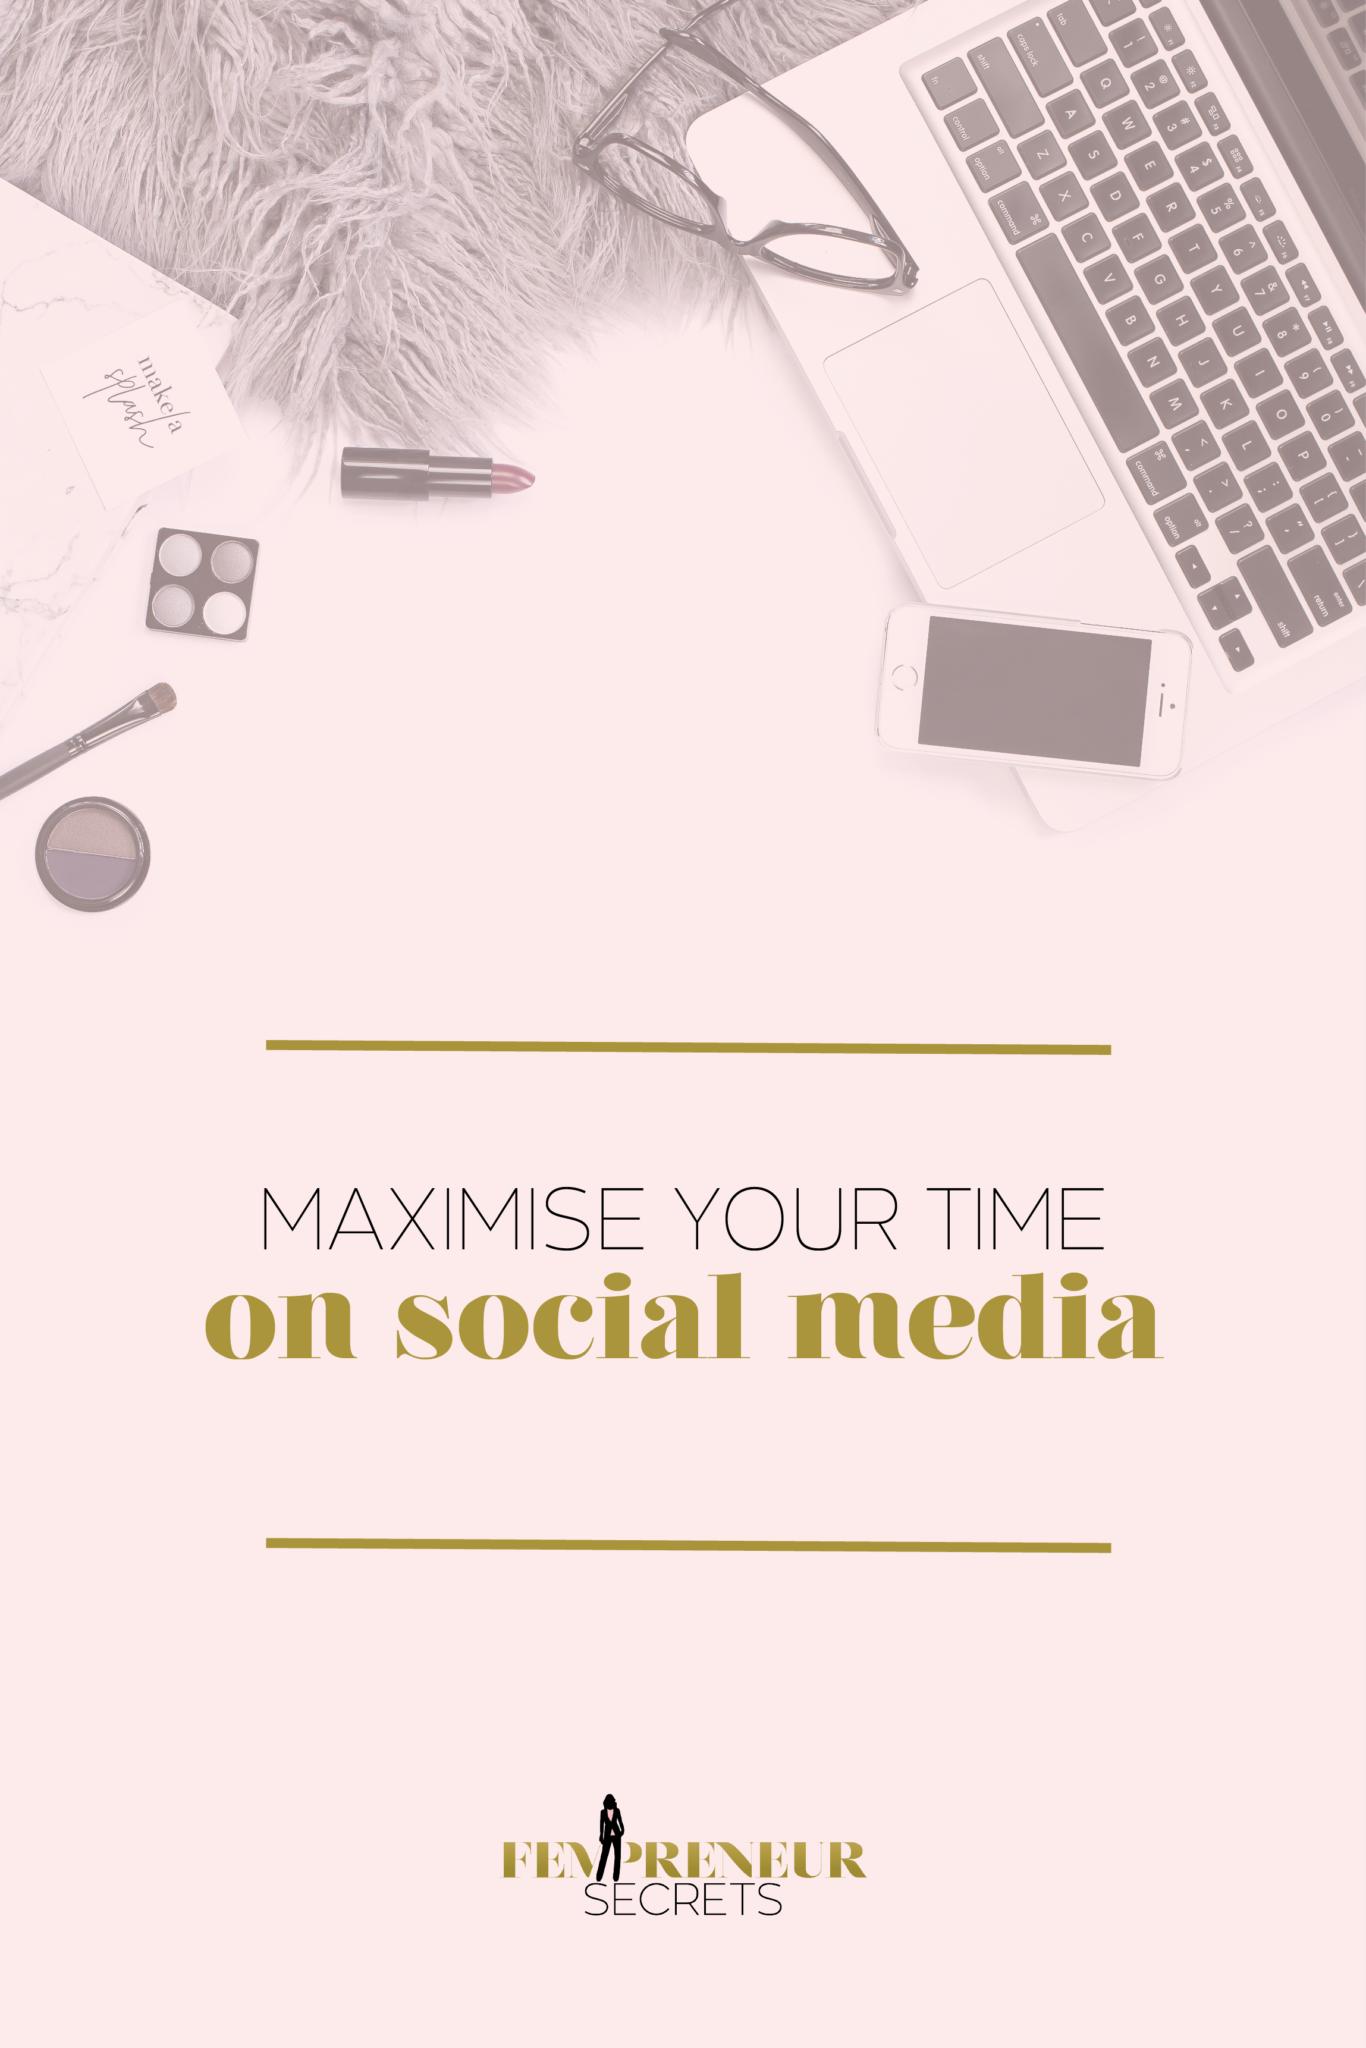 016-10-Social-Media-Habits-to-Change_Pinterest-2.png